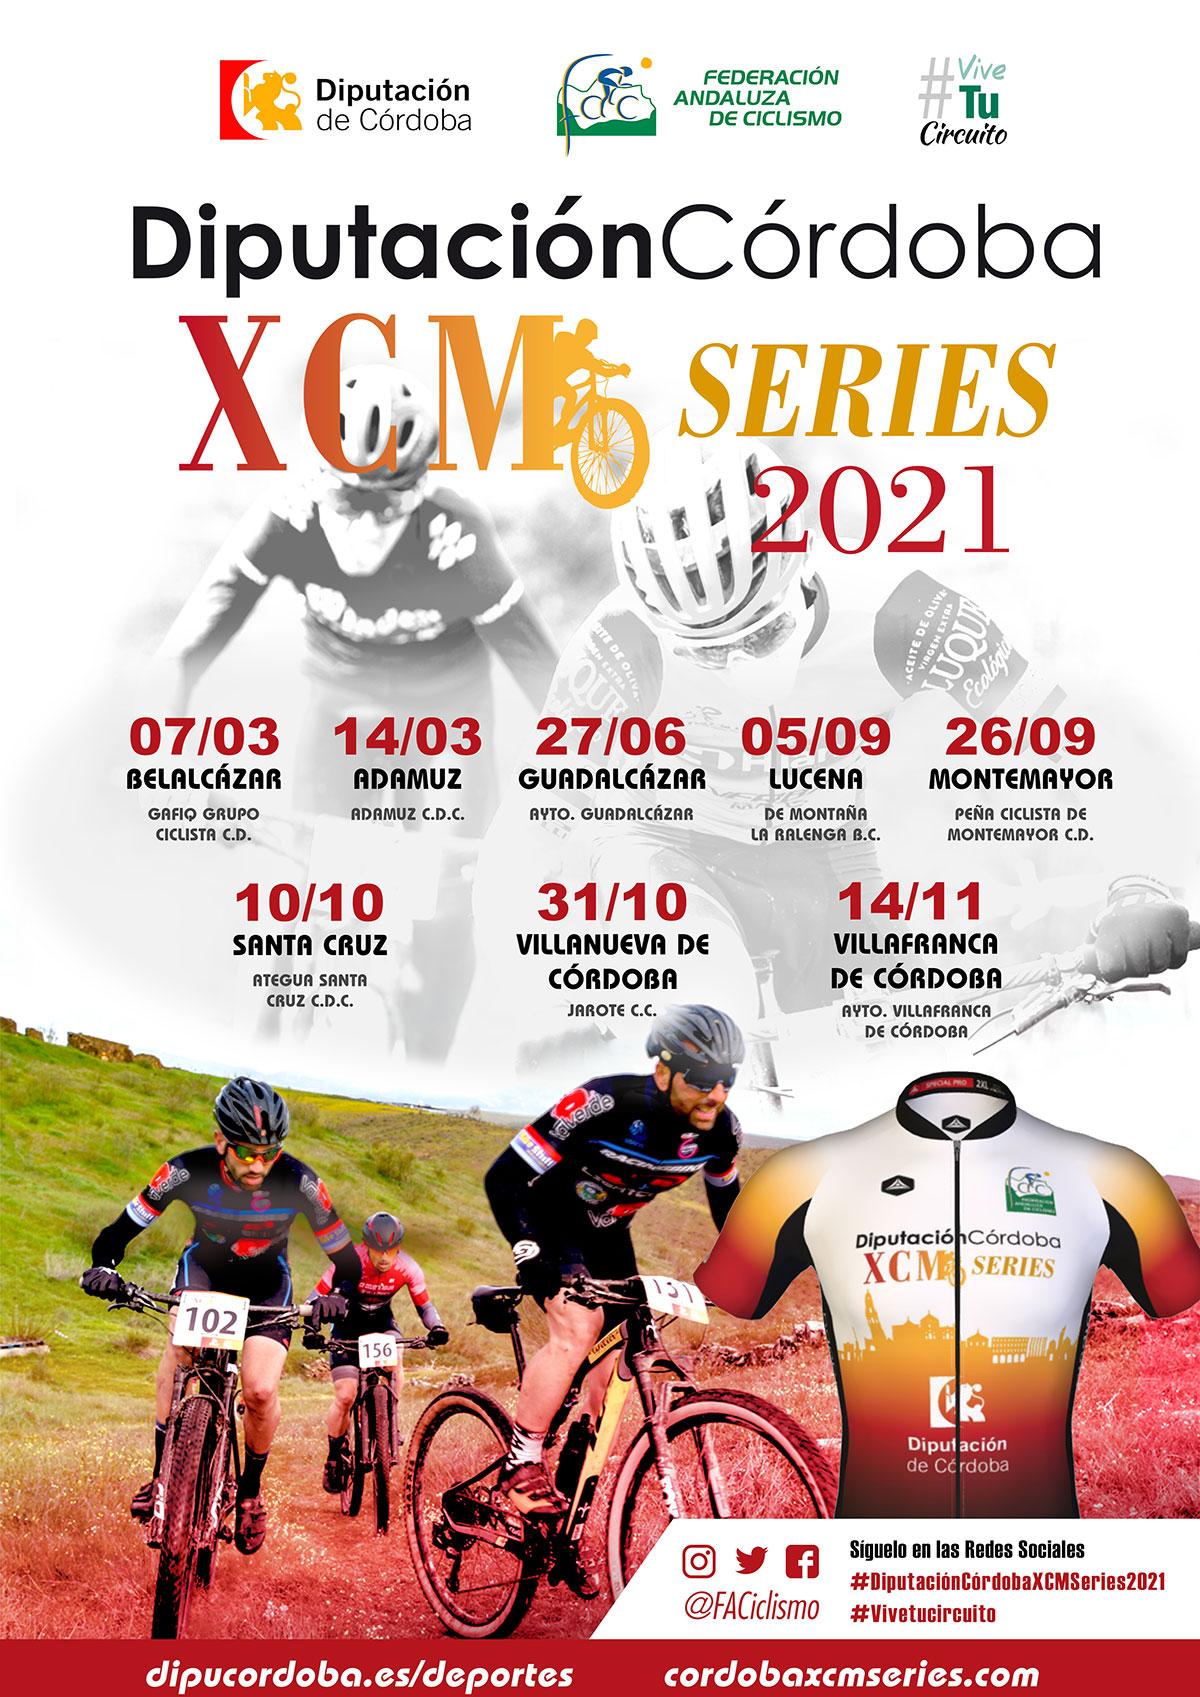 Guadalcázar se incorpora a las 'DiputaciónCórdoba XCM Series 2021'